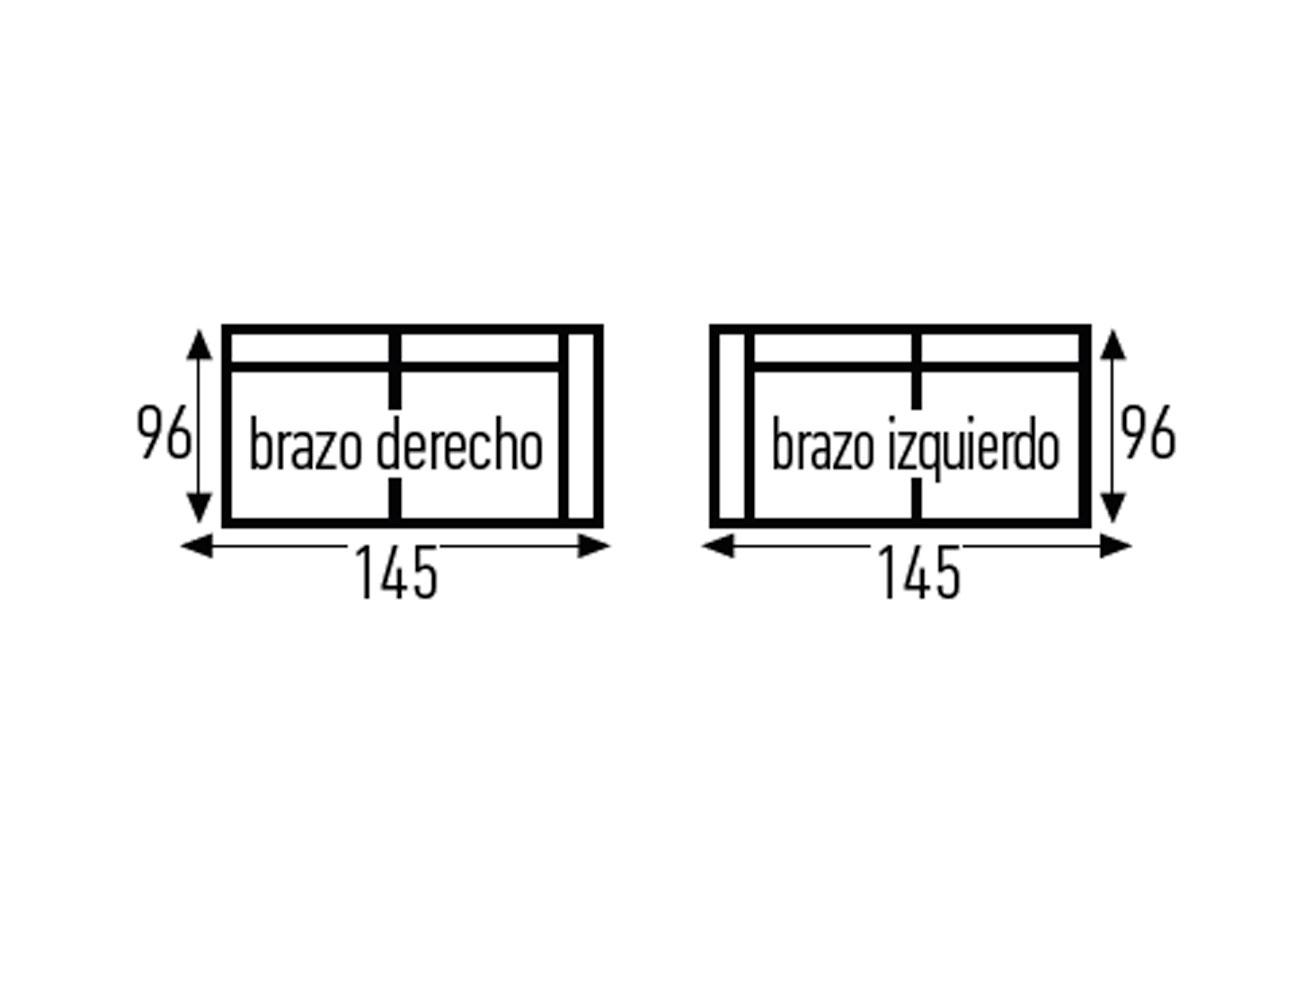 Croquis sofa sin 1 brazo 1453